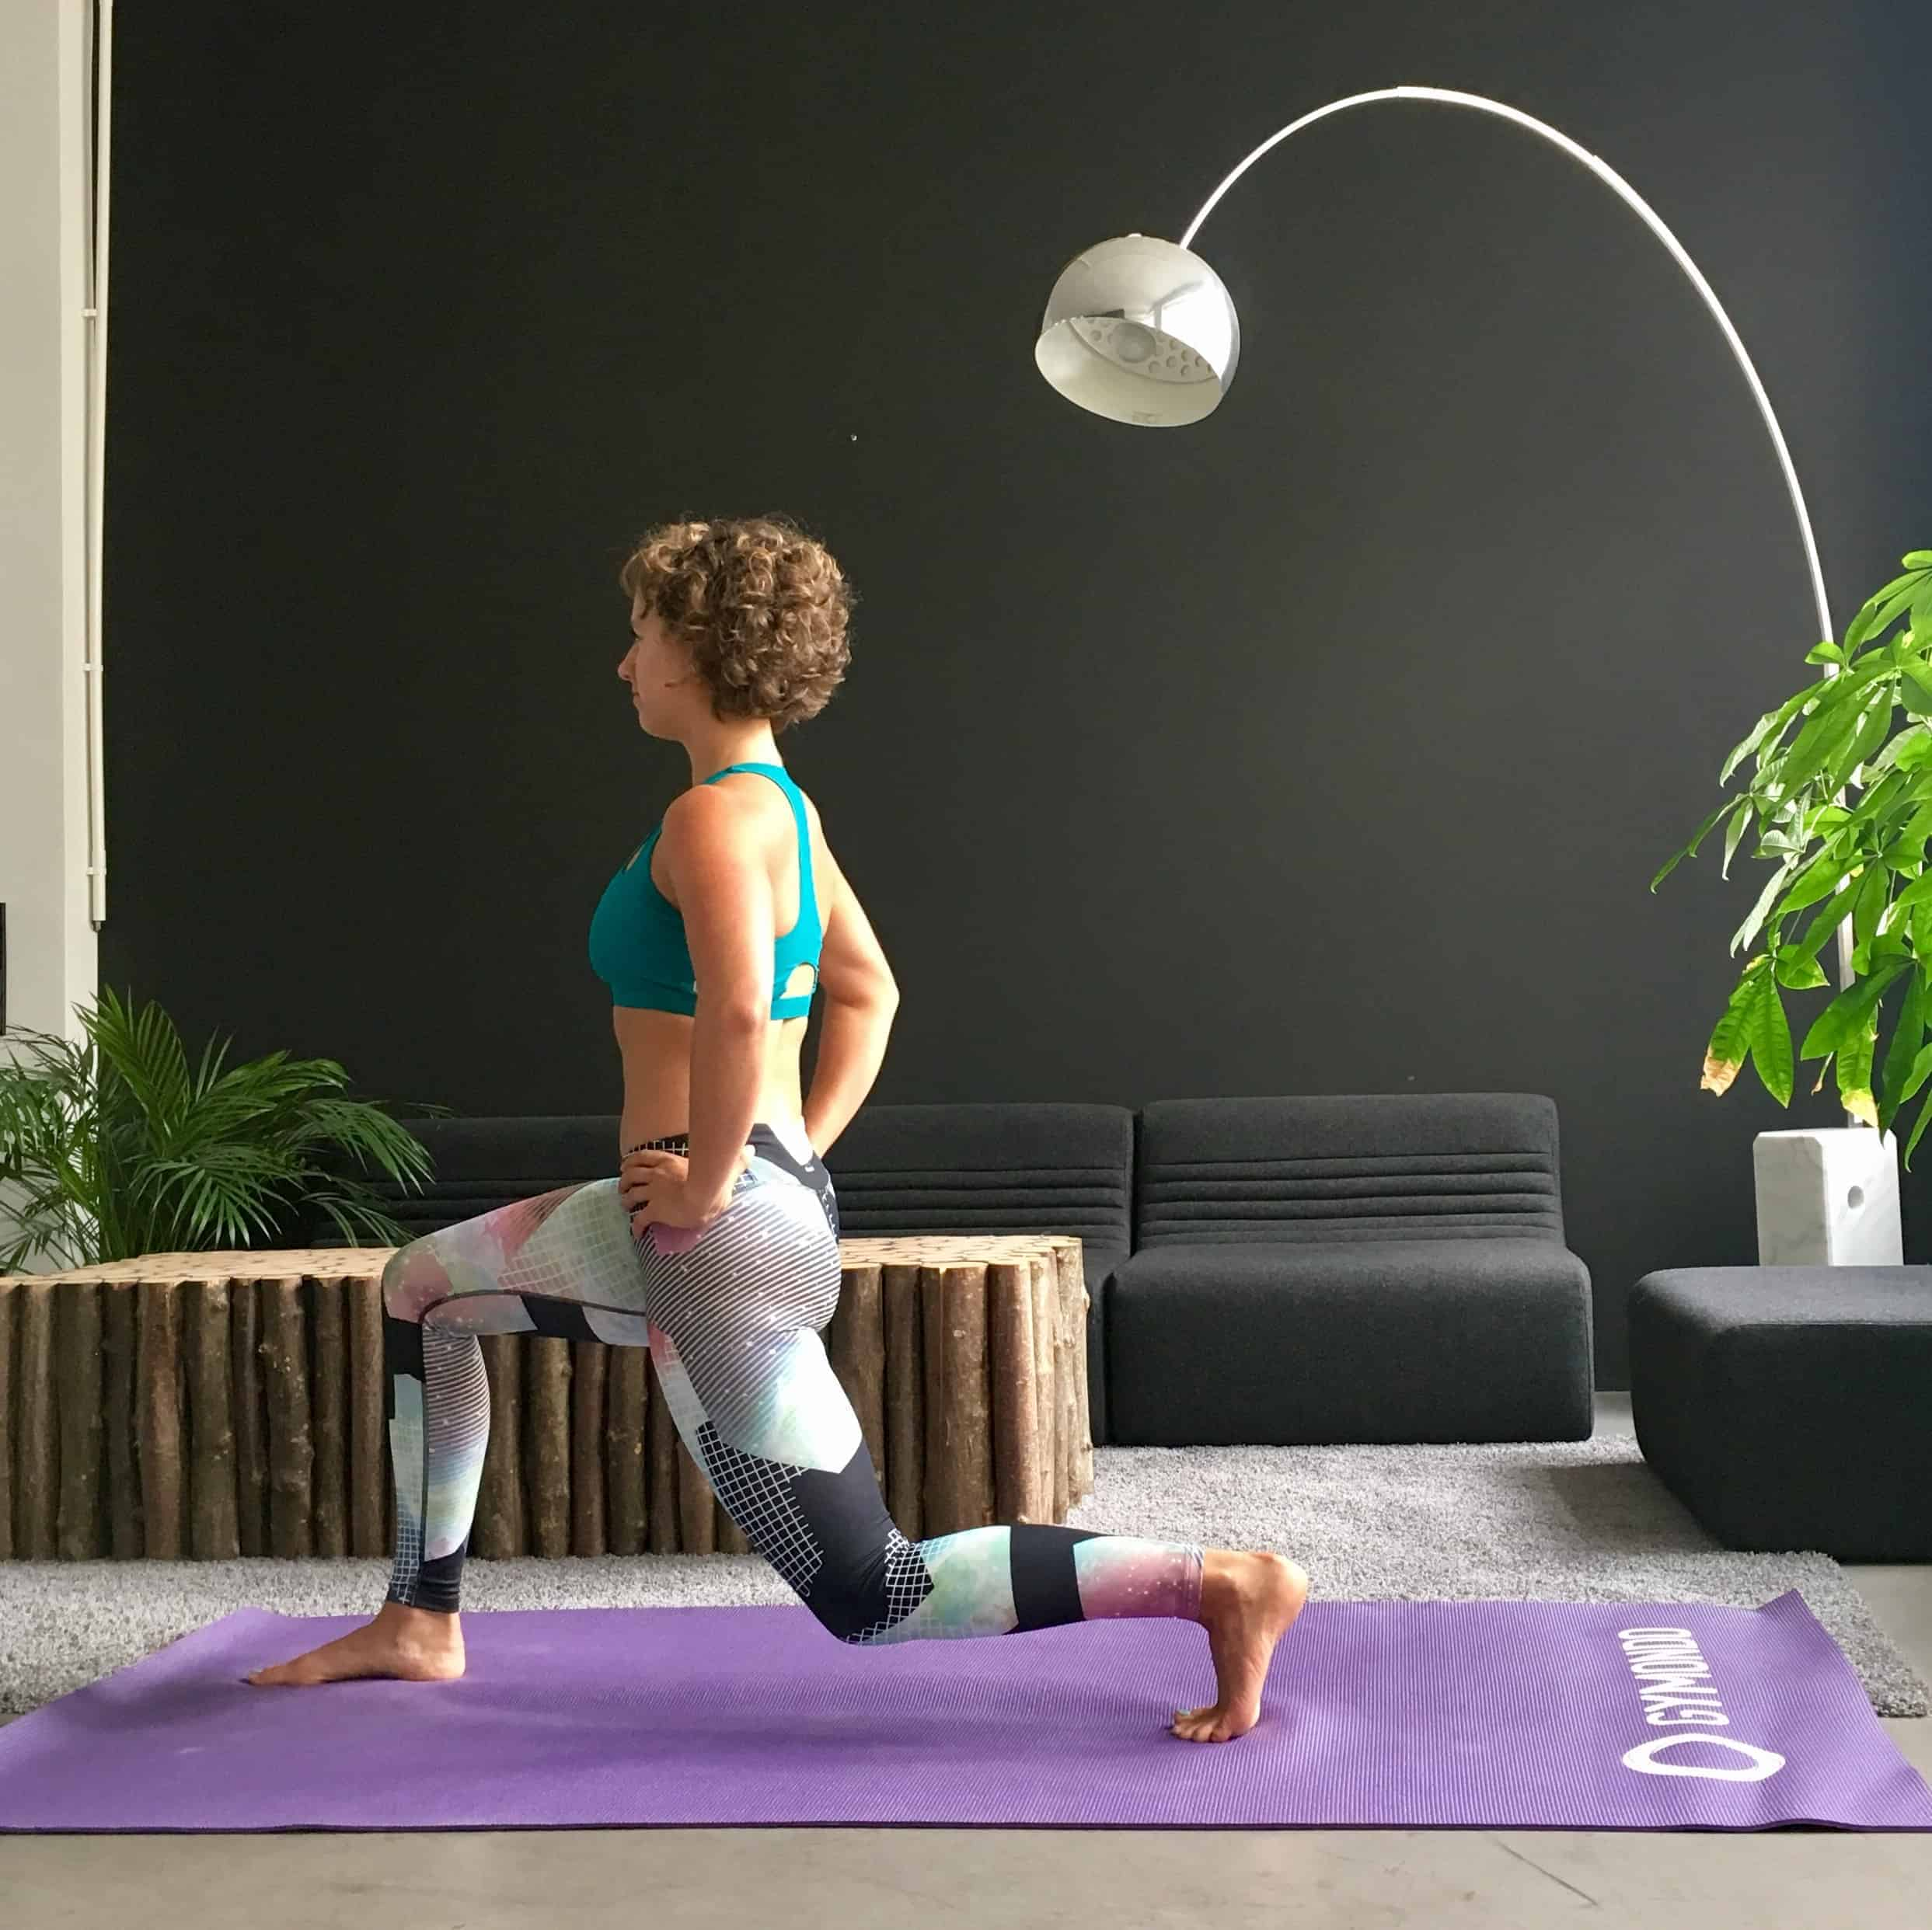 Frau macht Lunges auf lila trainingsmatte